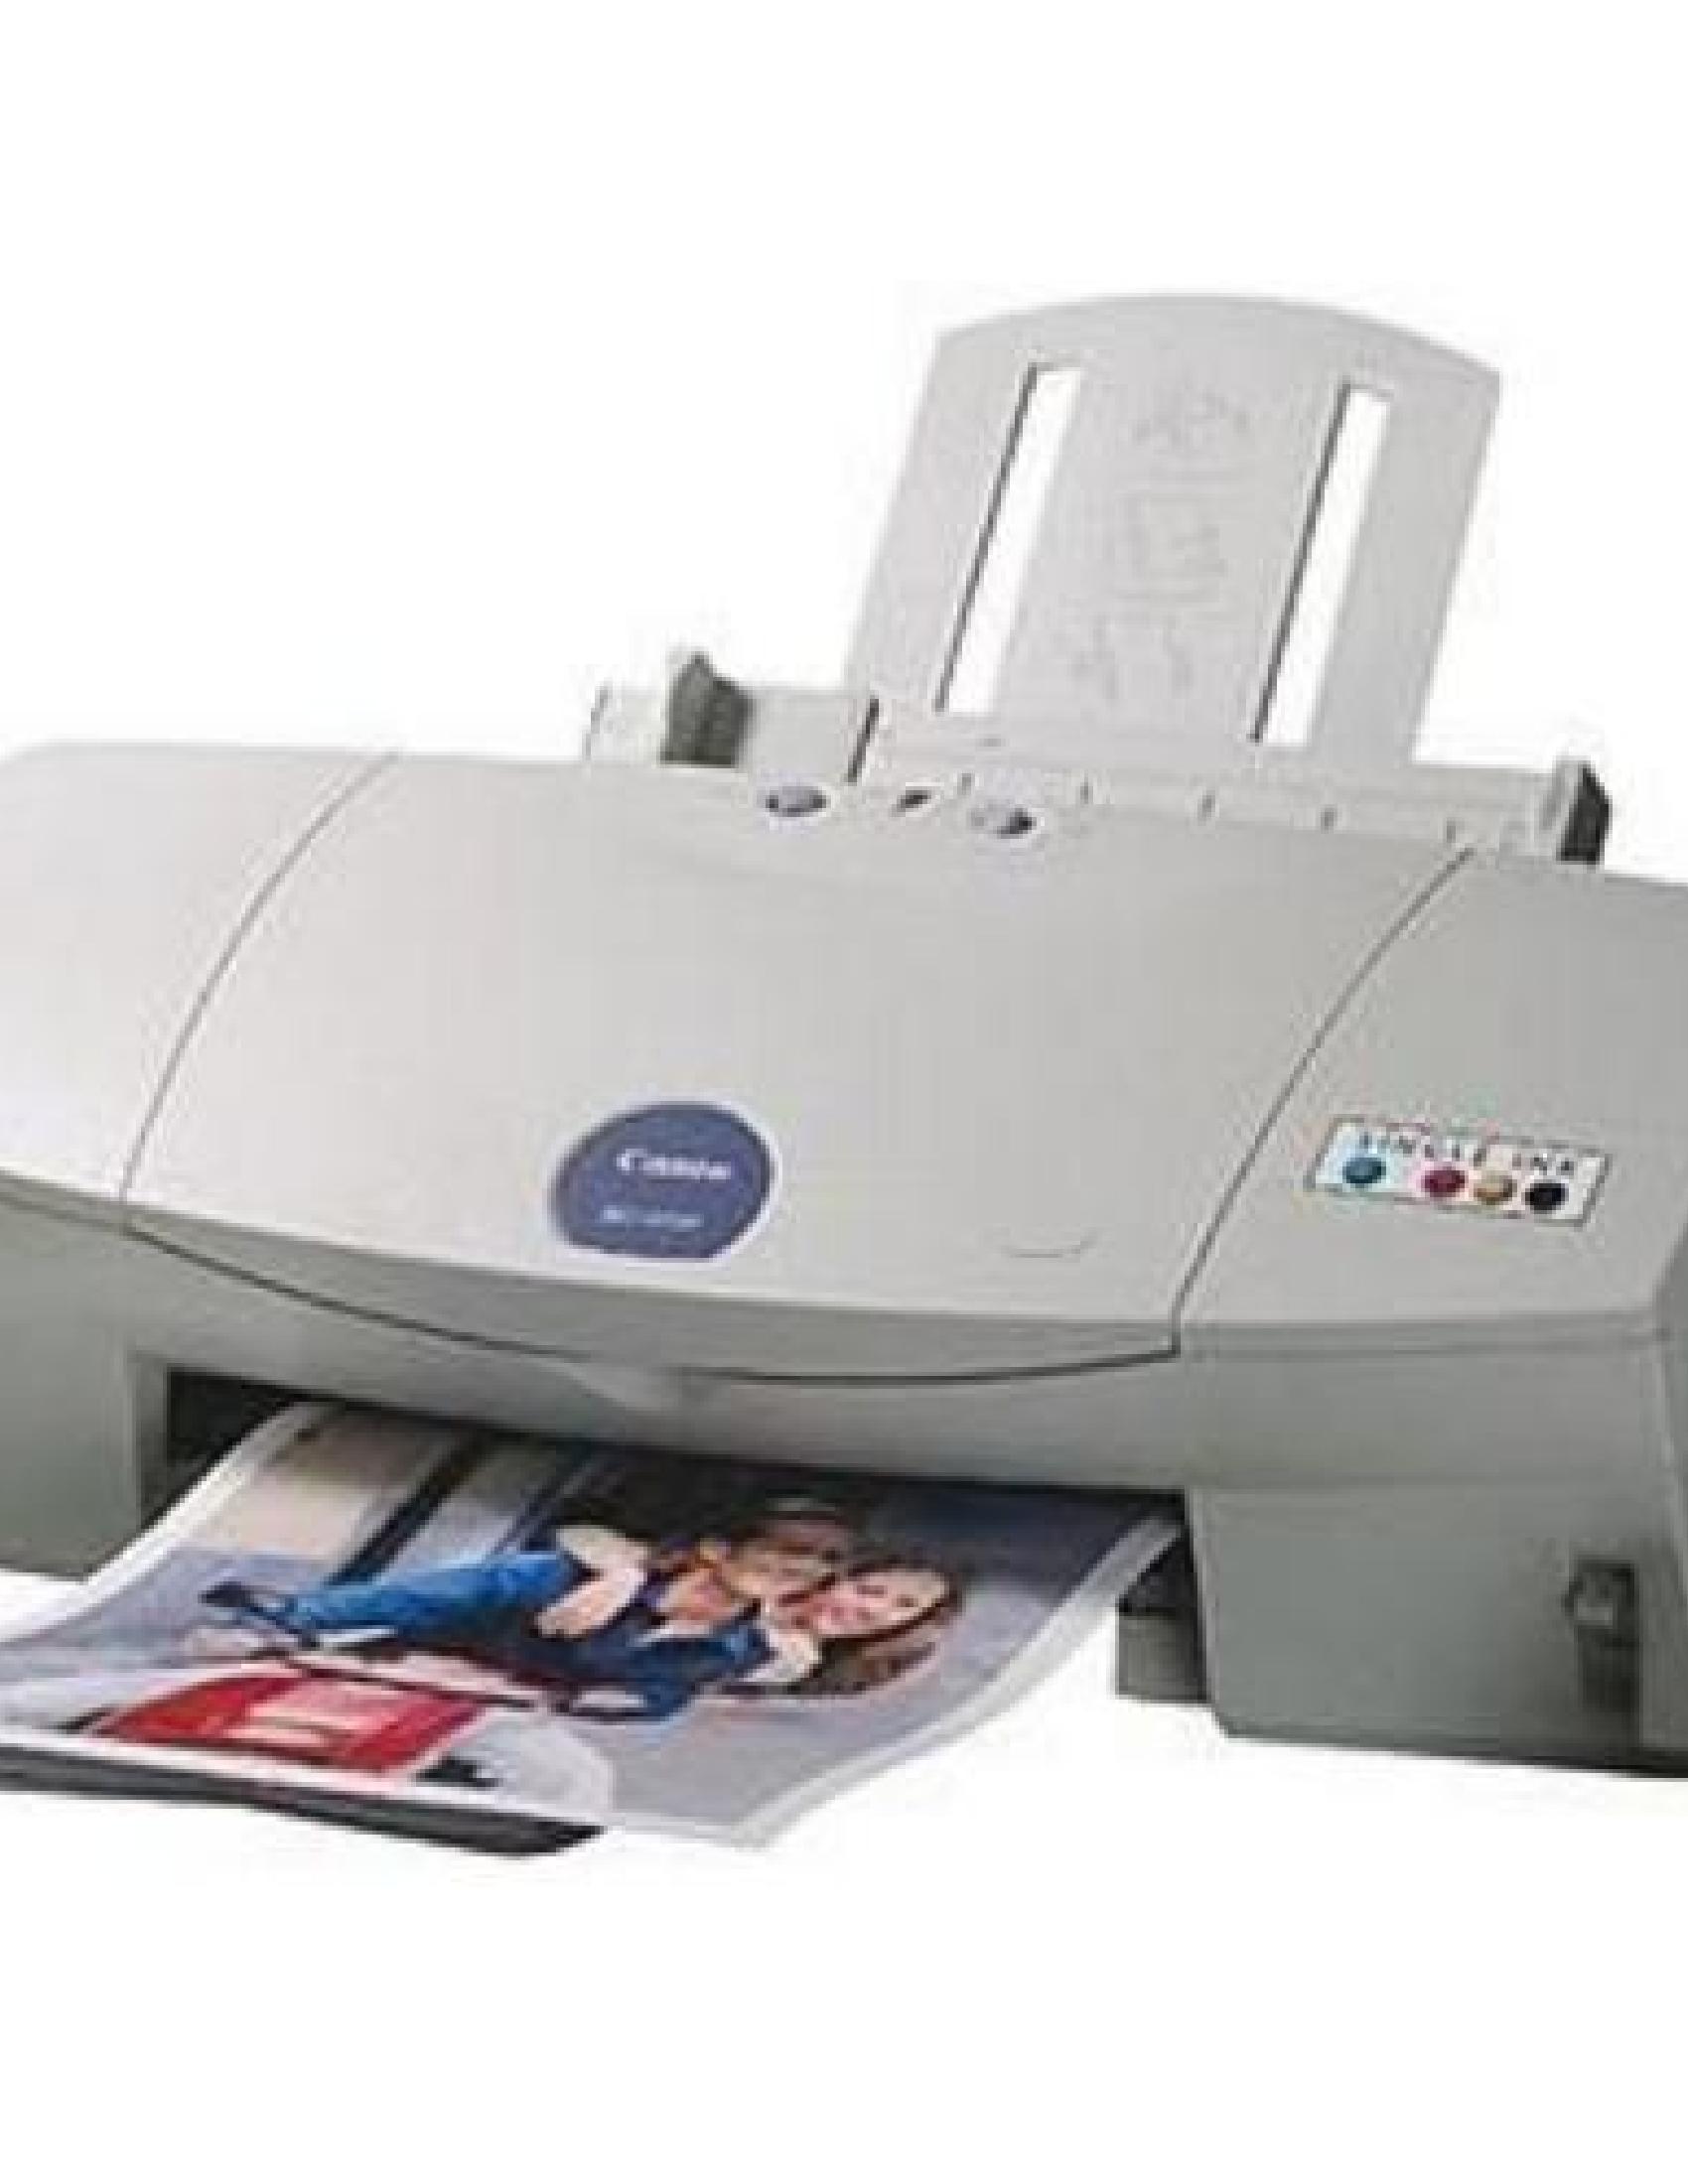 Canon BJC-6200 Printer manual